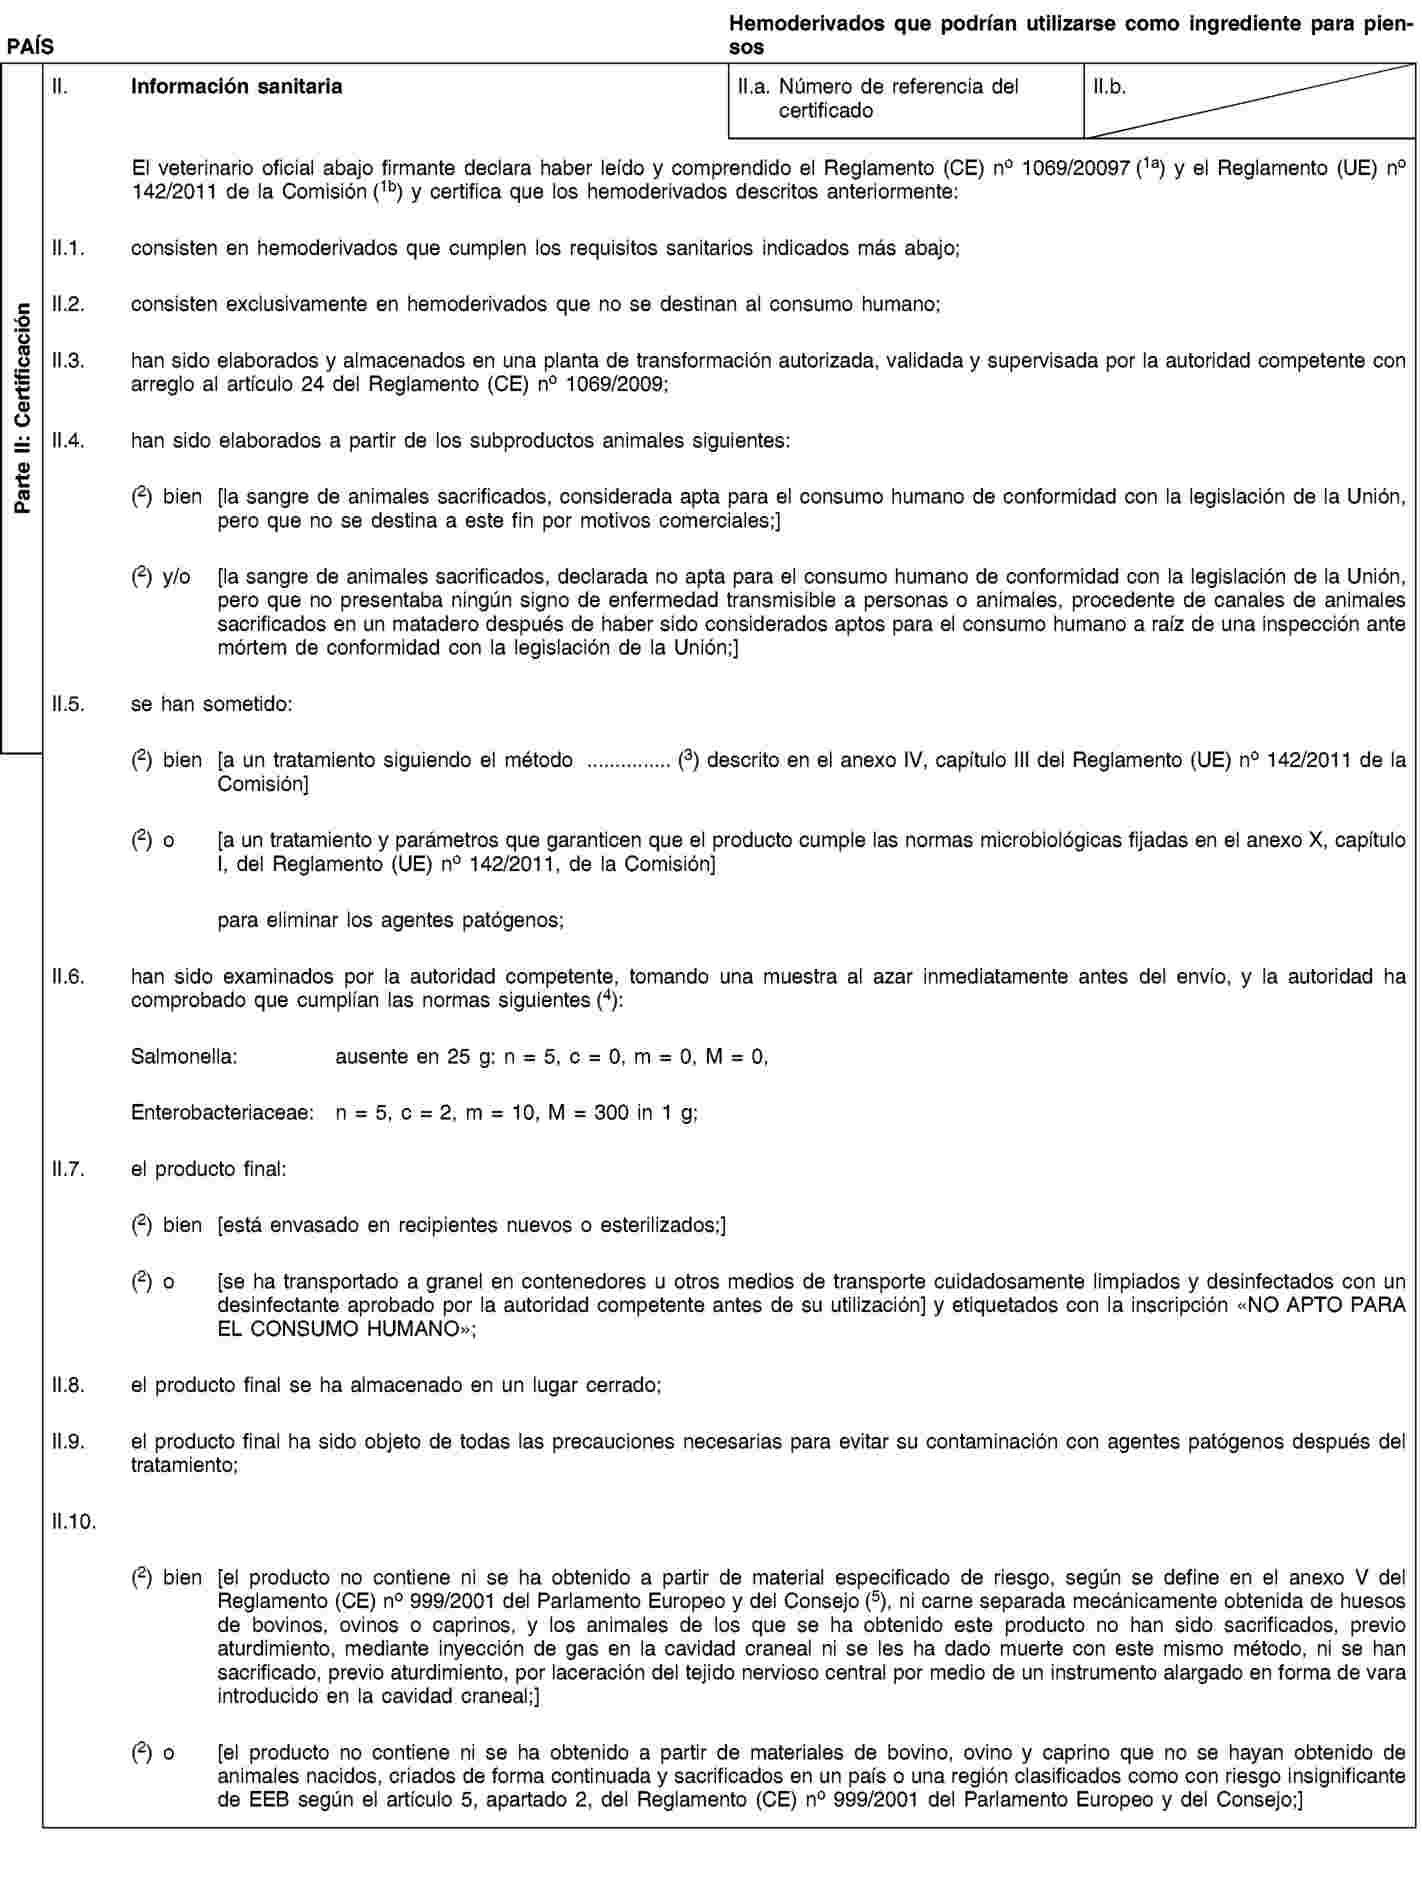 Imagen: https://eur-lex.europa.eu/resource.html?uri=uriserv:OJ.L_.2011.054.01.0001.01.SPA.xhtml.L_2011054ES.01016601.tif.jpg